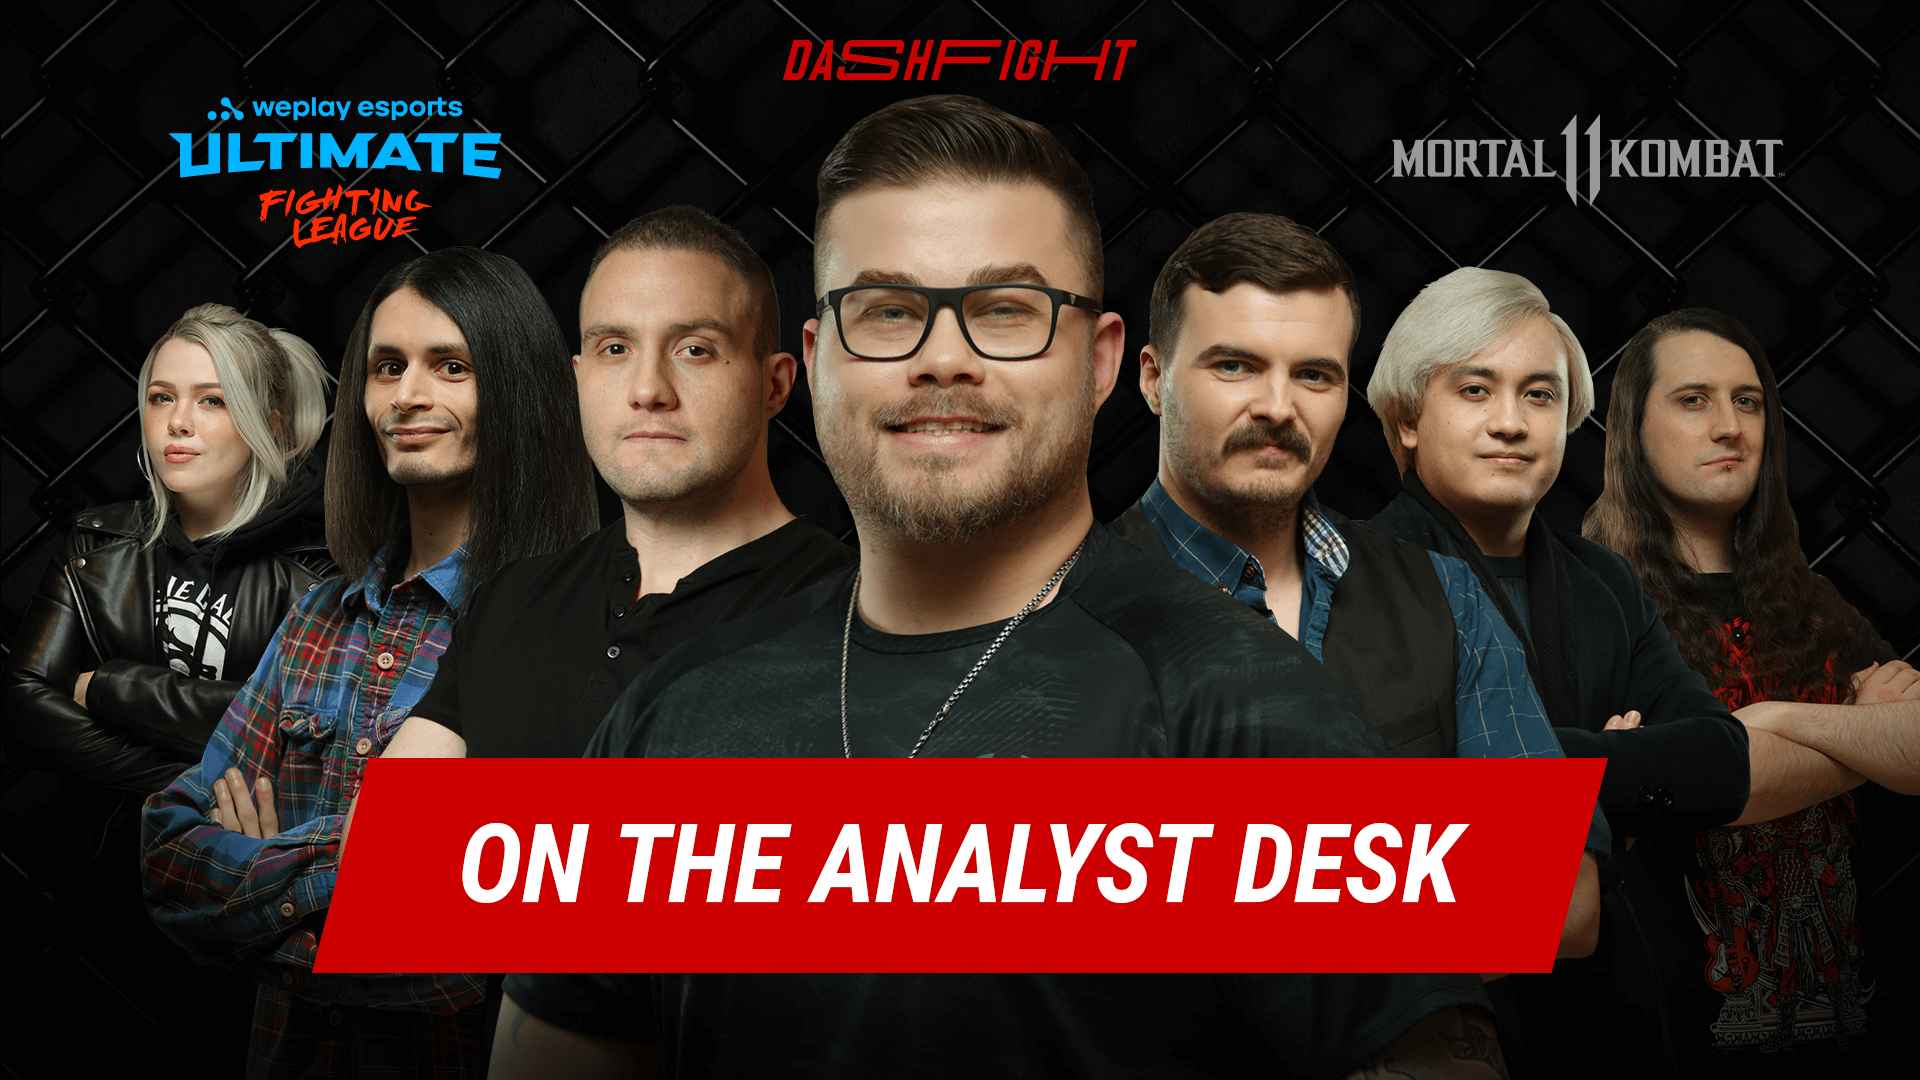 WUFL MK11 Season 1 - On the Analyst Desk